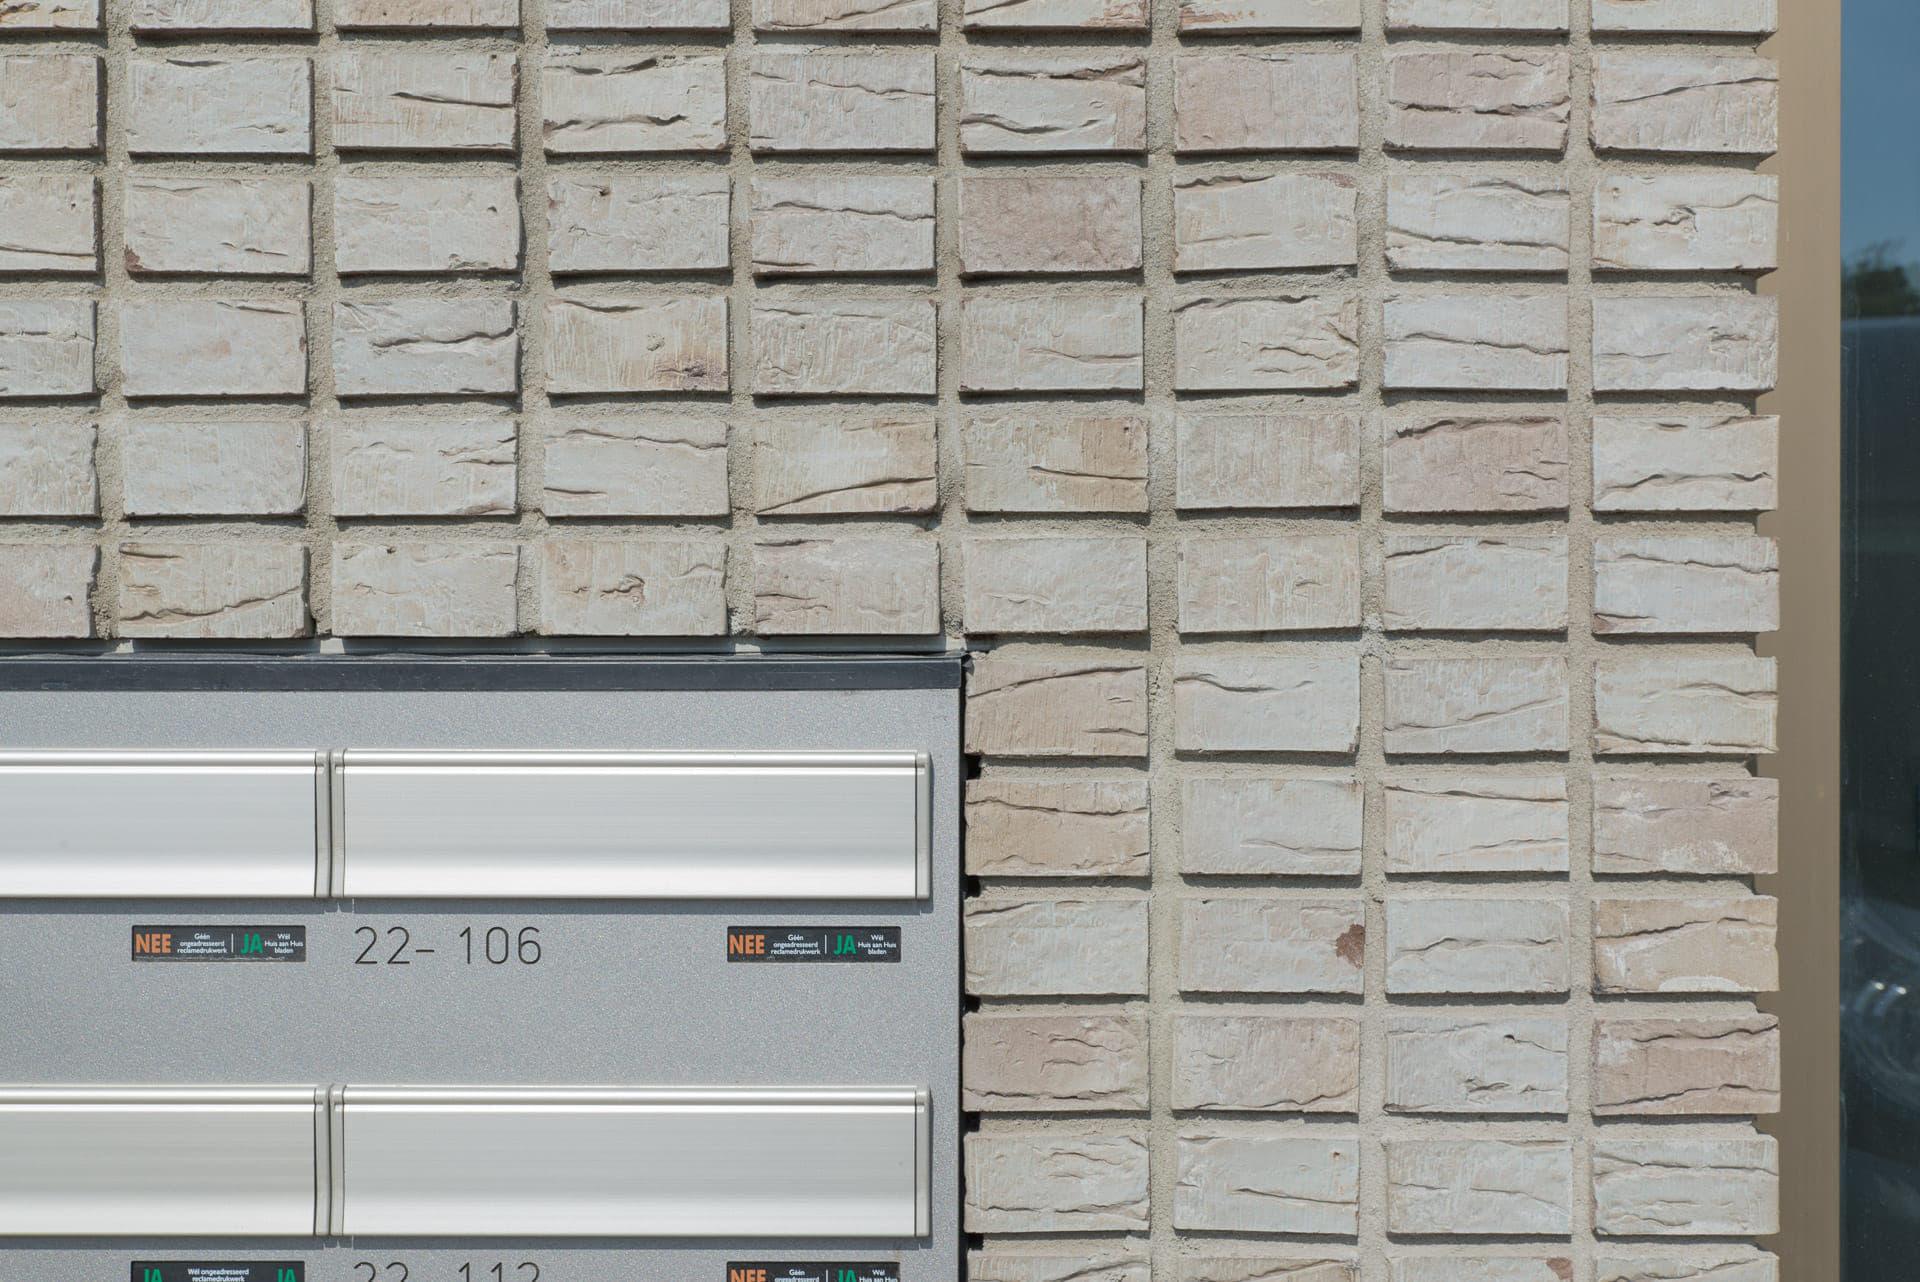 De Kaap in Hoogeveen metselwerk dikformaat met brievenbus